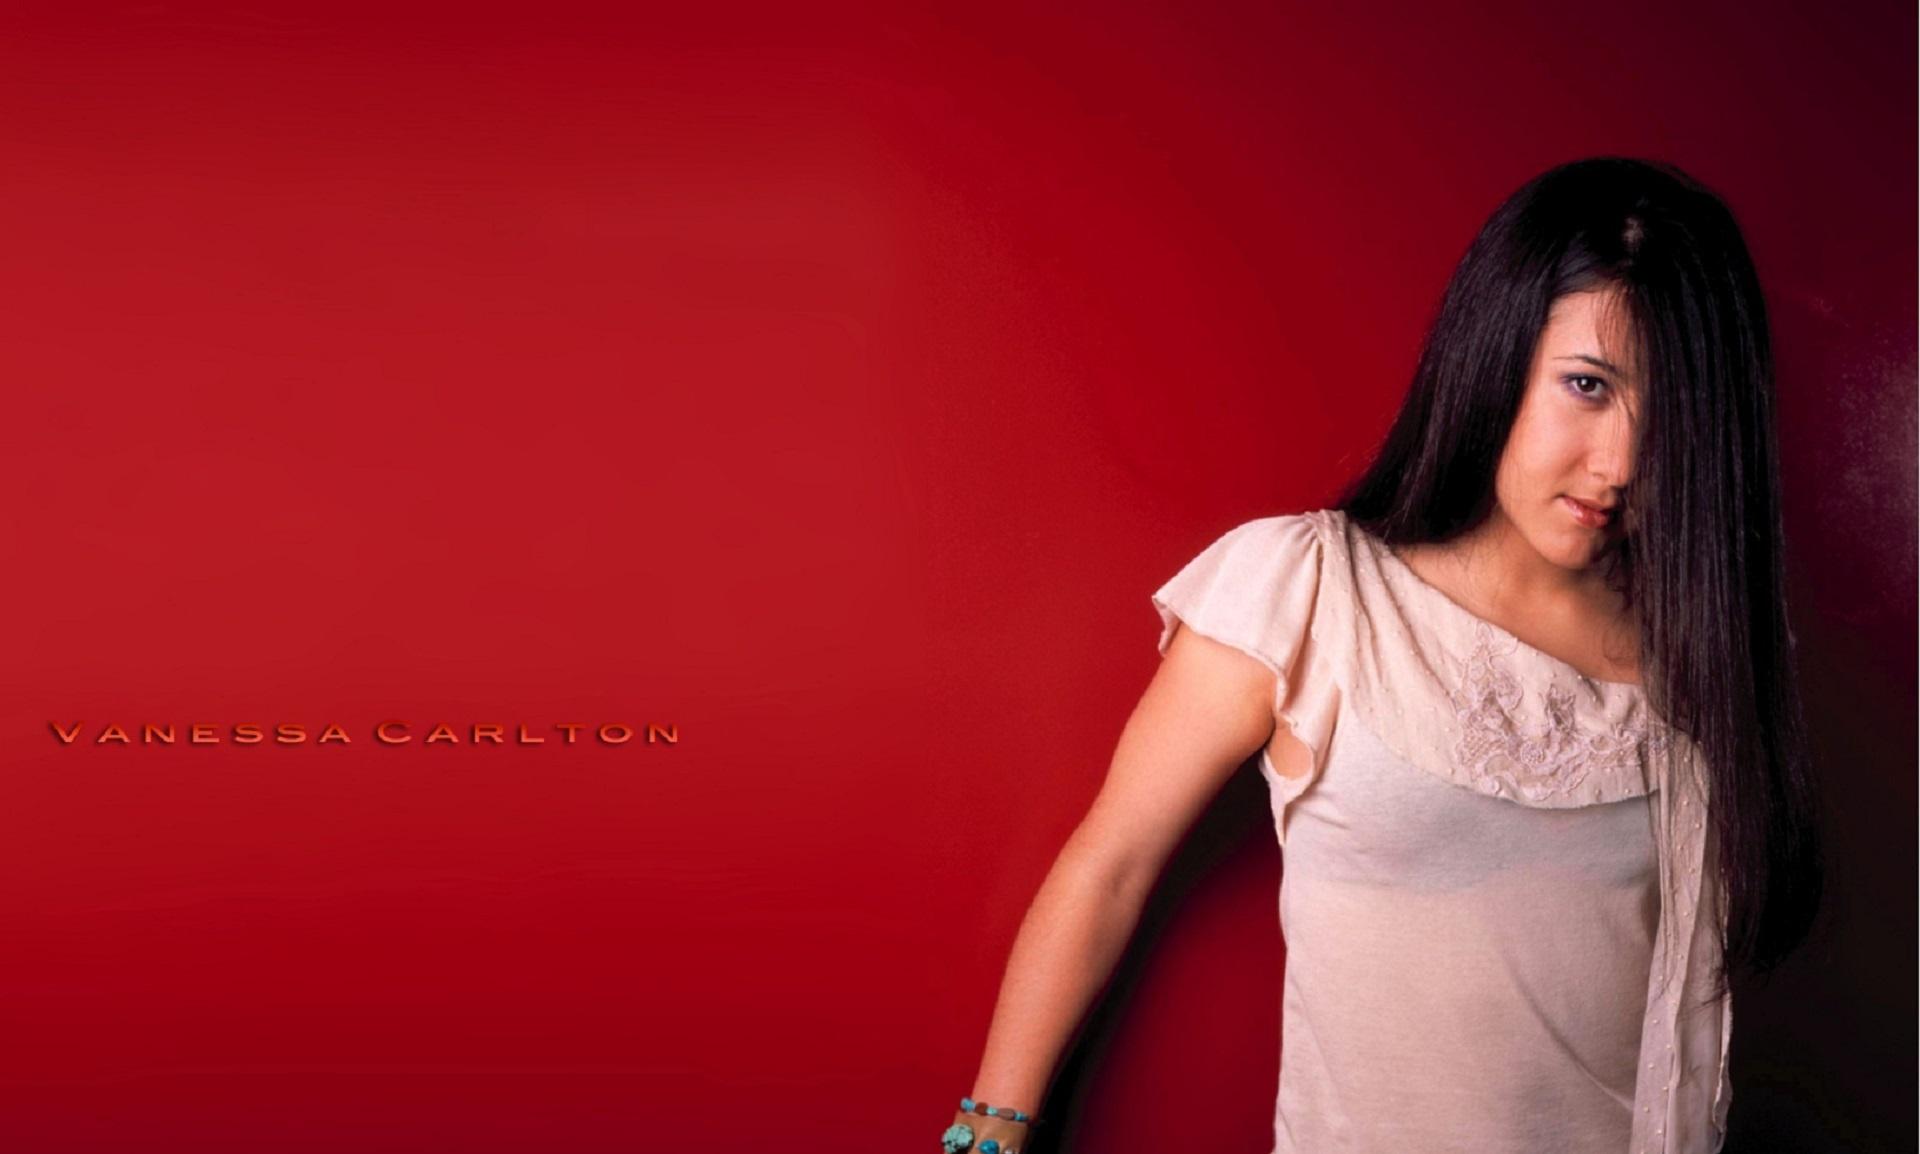 Vanessa Carlton Hd Desktop